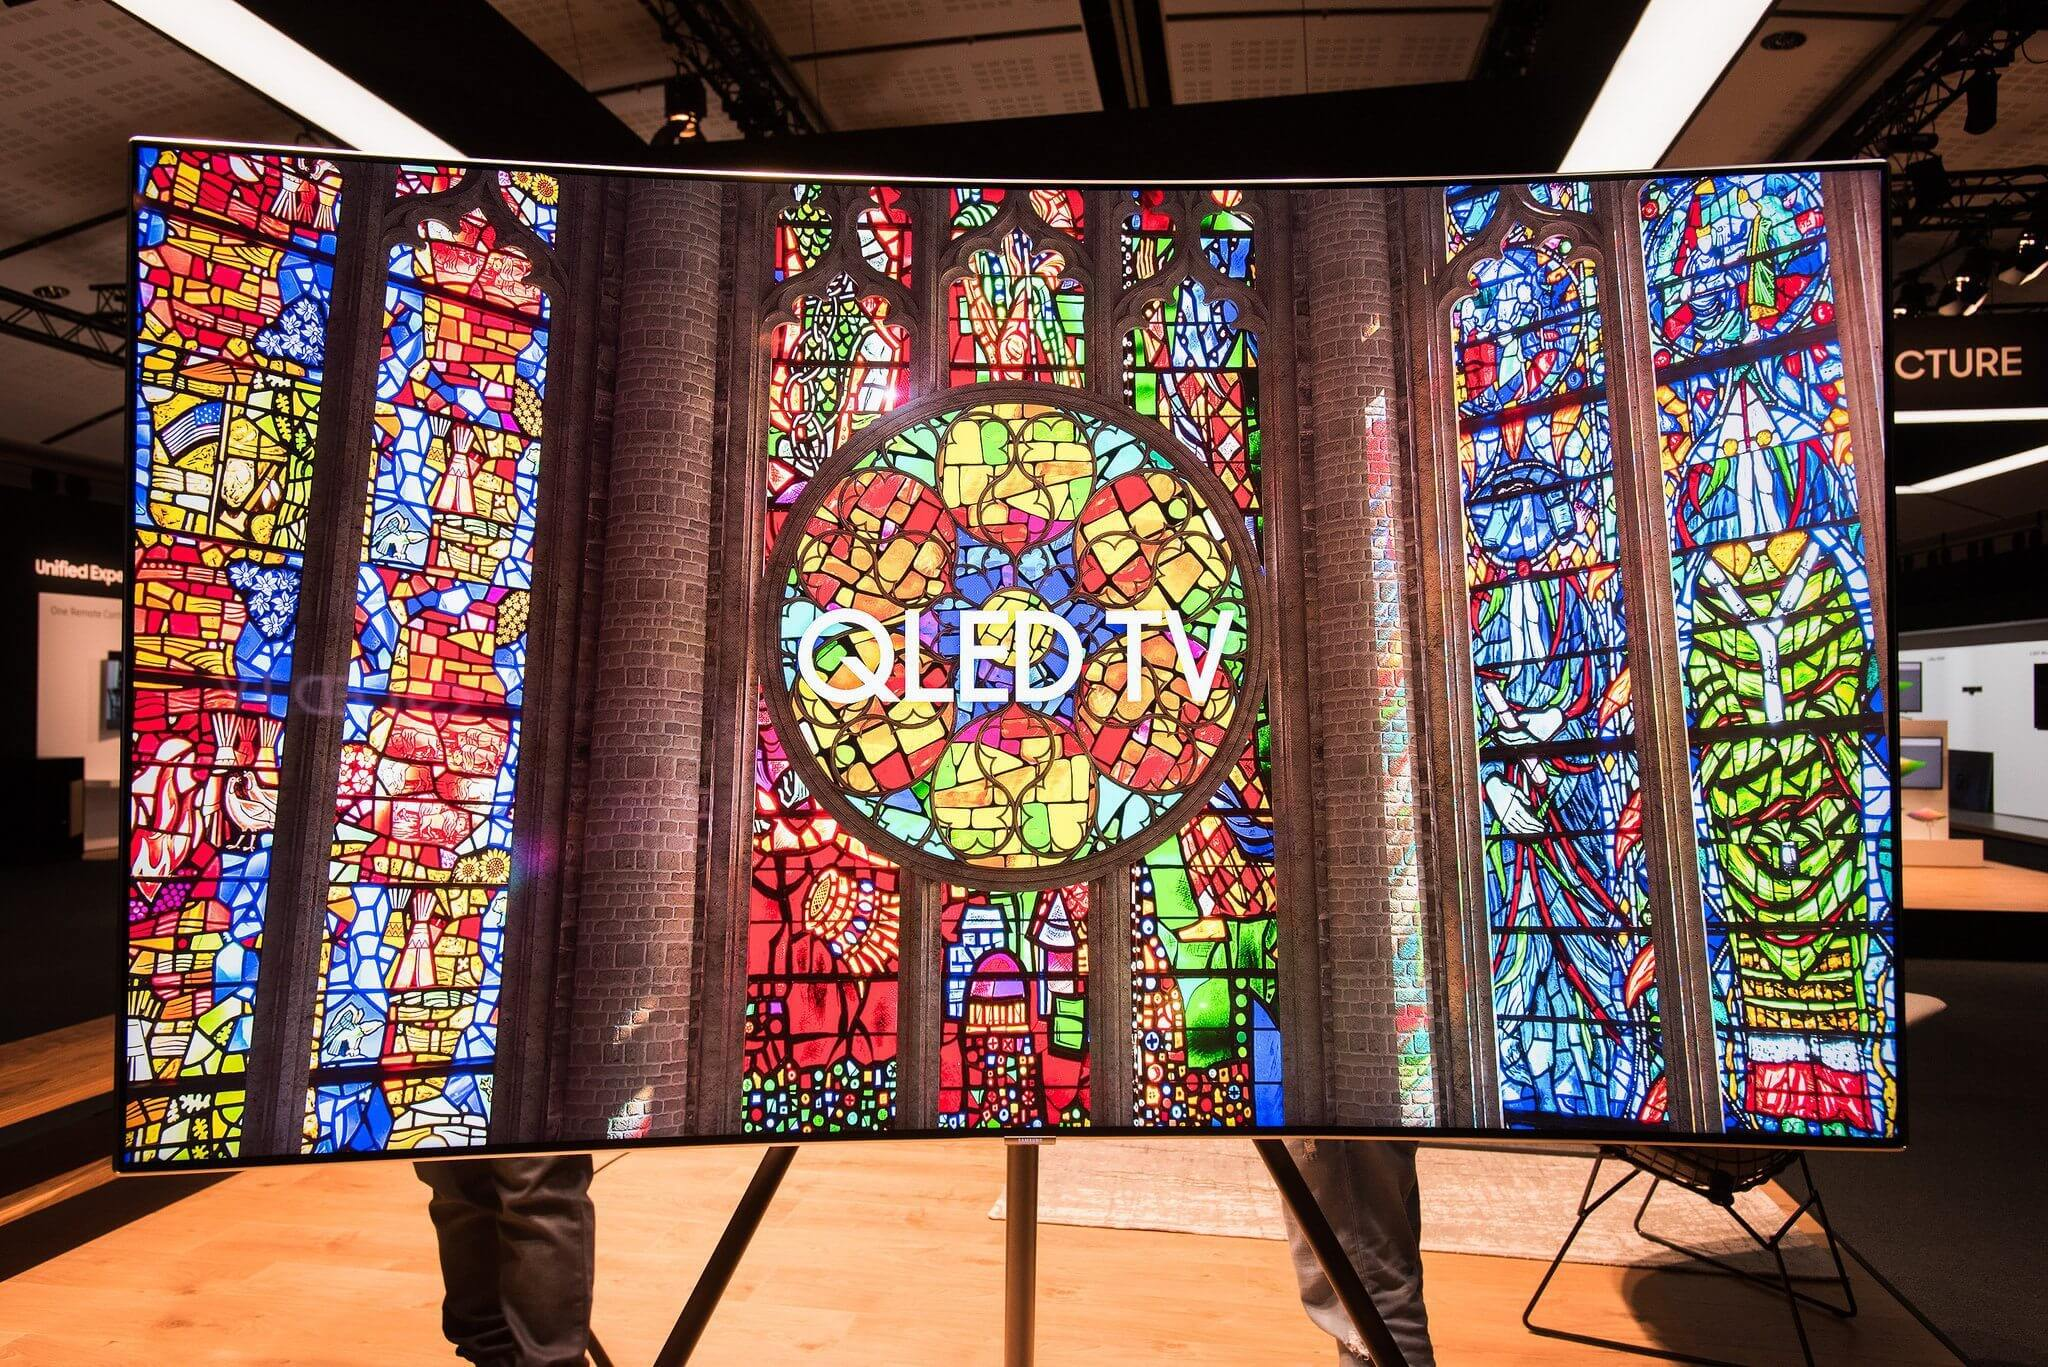 Samsung QLED TV 4K